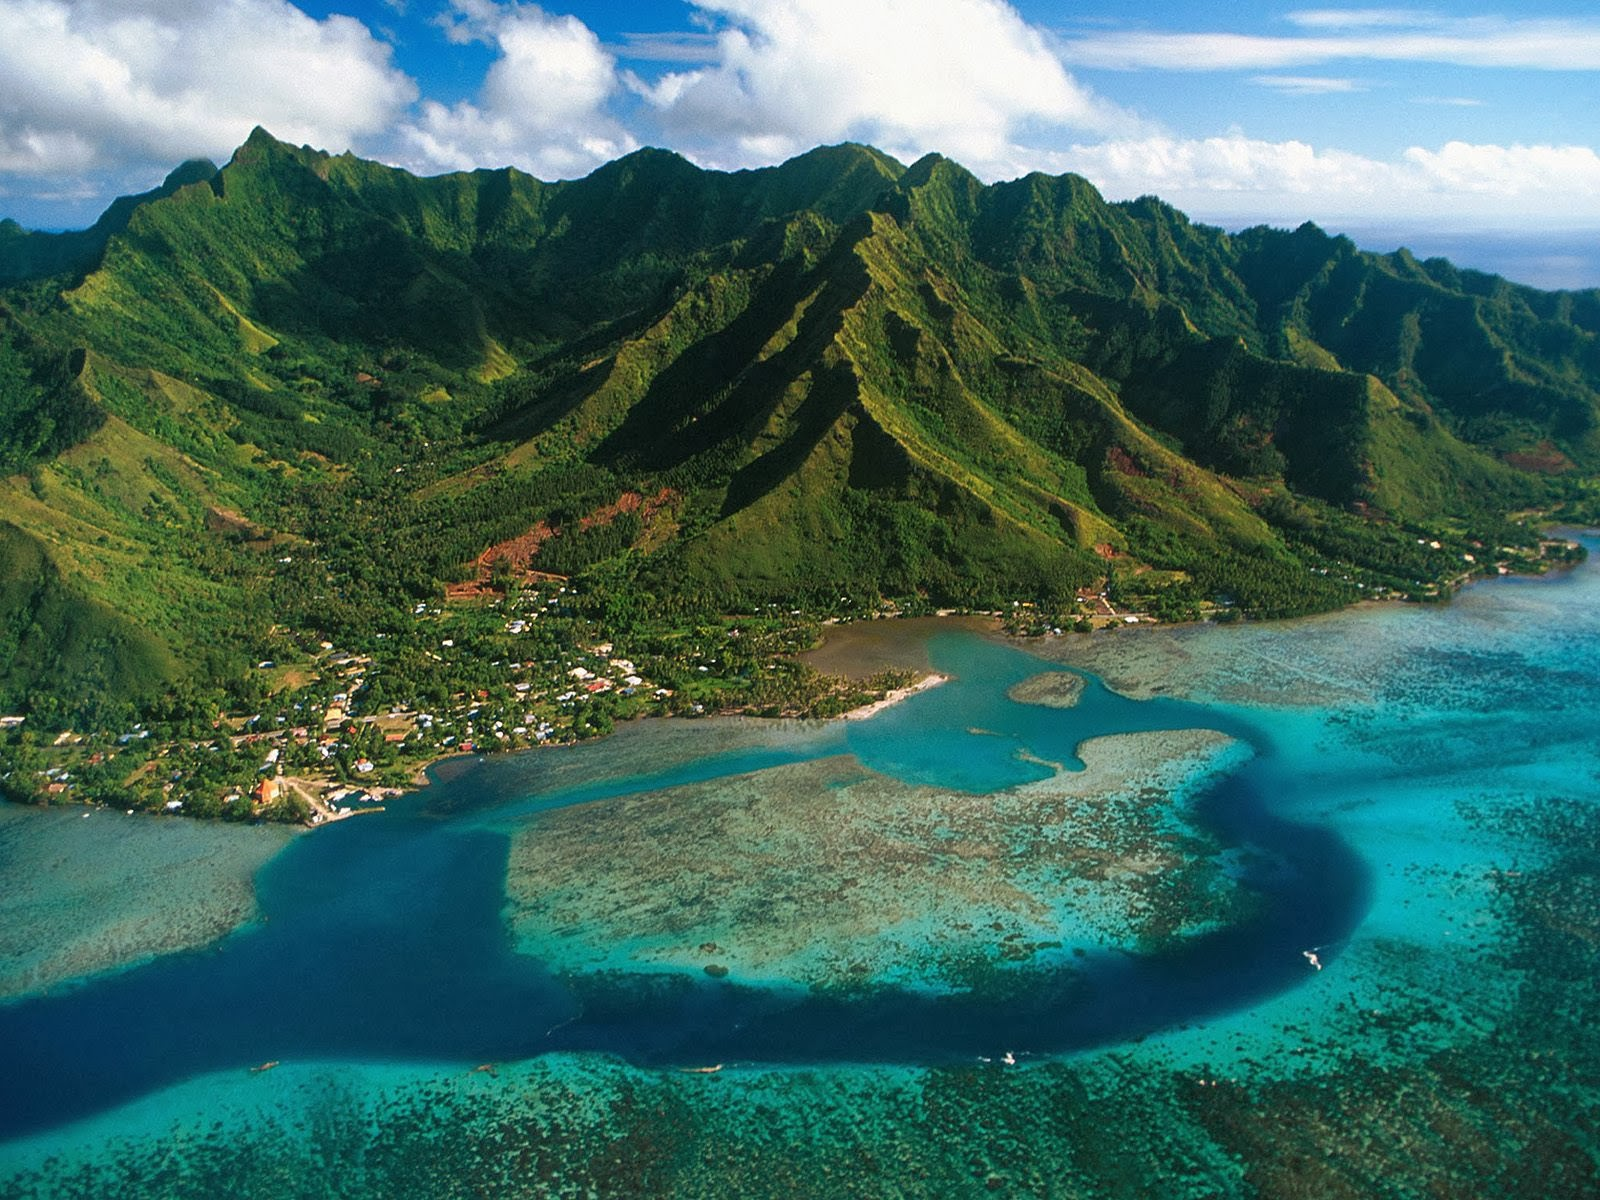 honeymoon in Moorea, Plage de Toaroto,Tetiaroa, holiday in tahiti, vacation in Bora Bora, Moorea holiday, Brando resort, garden of eden, surfing, trekking, diving